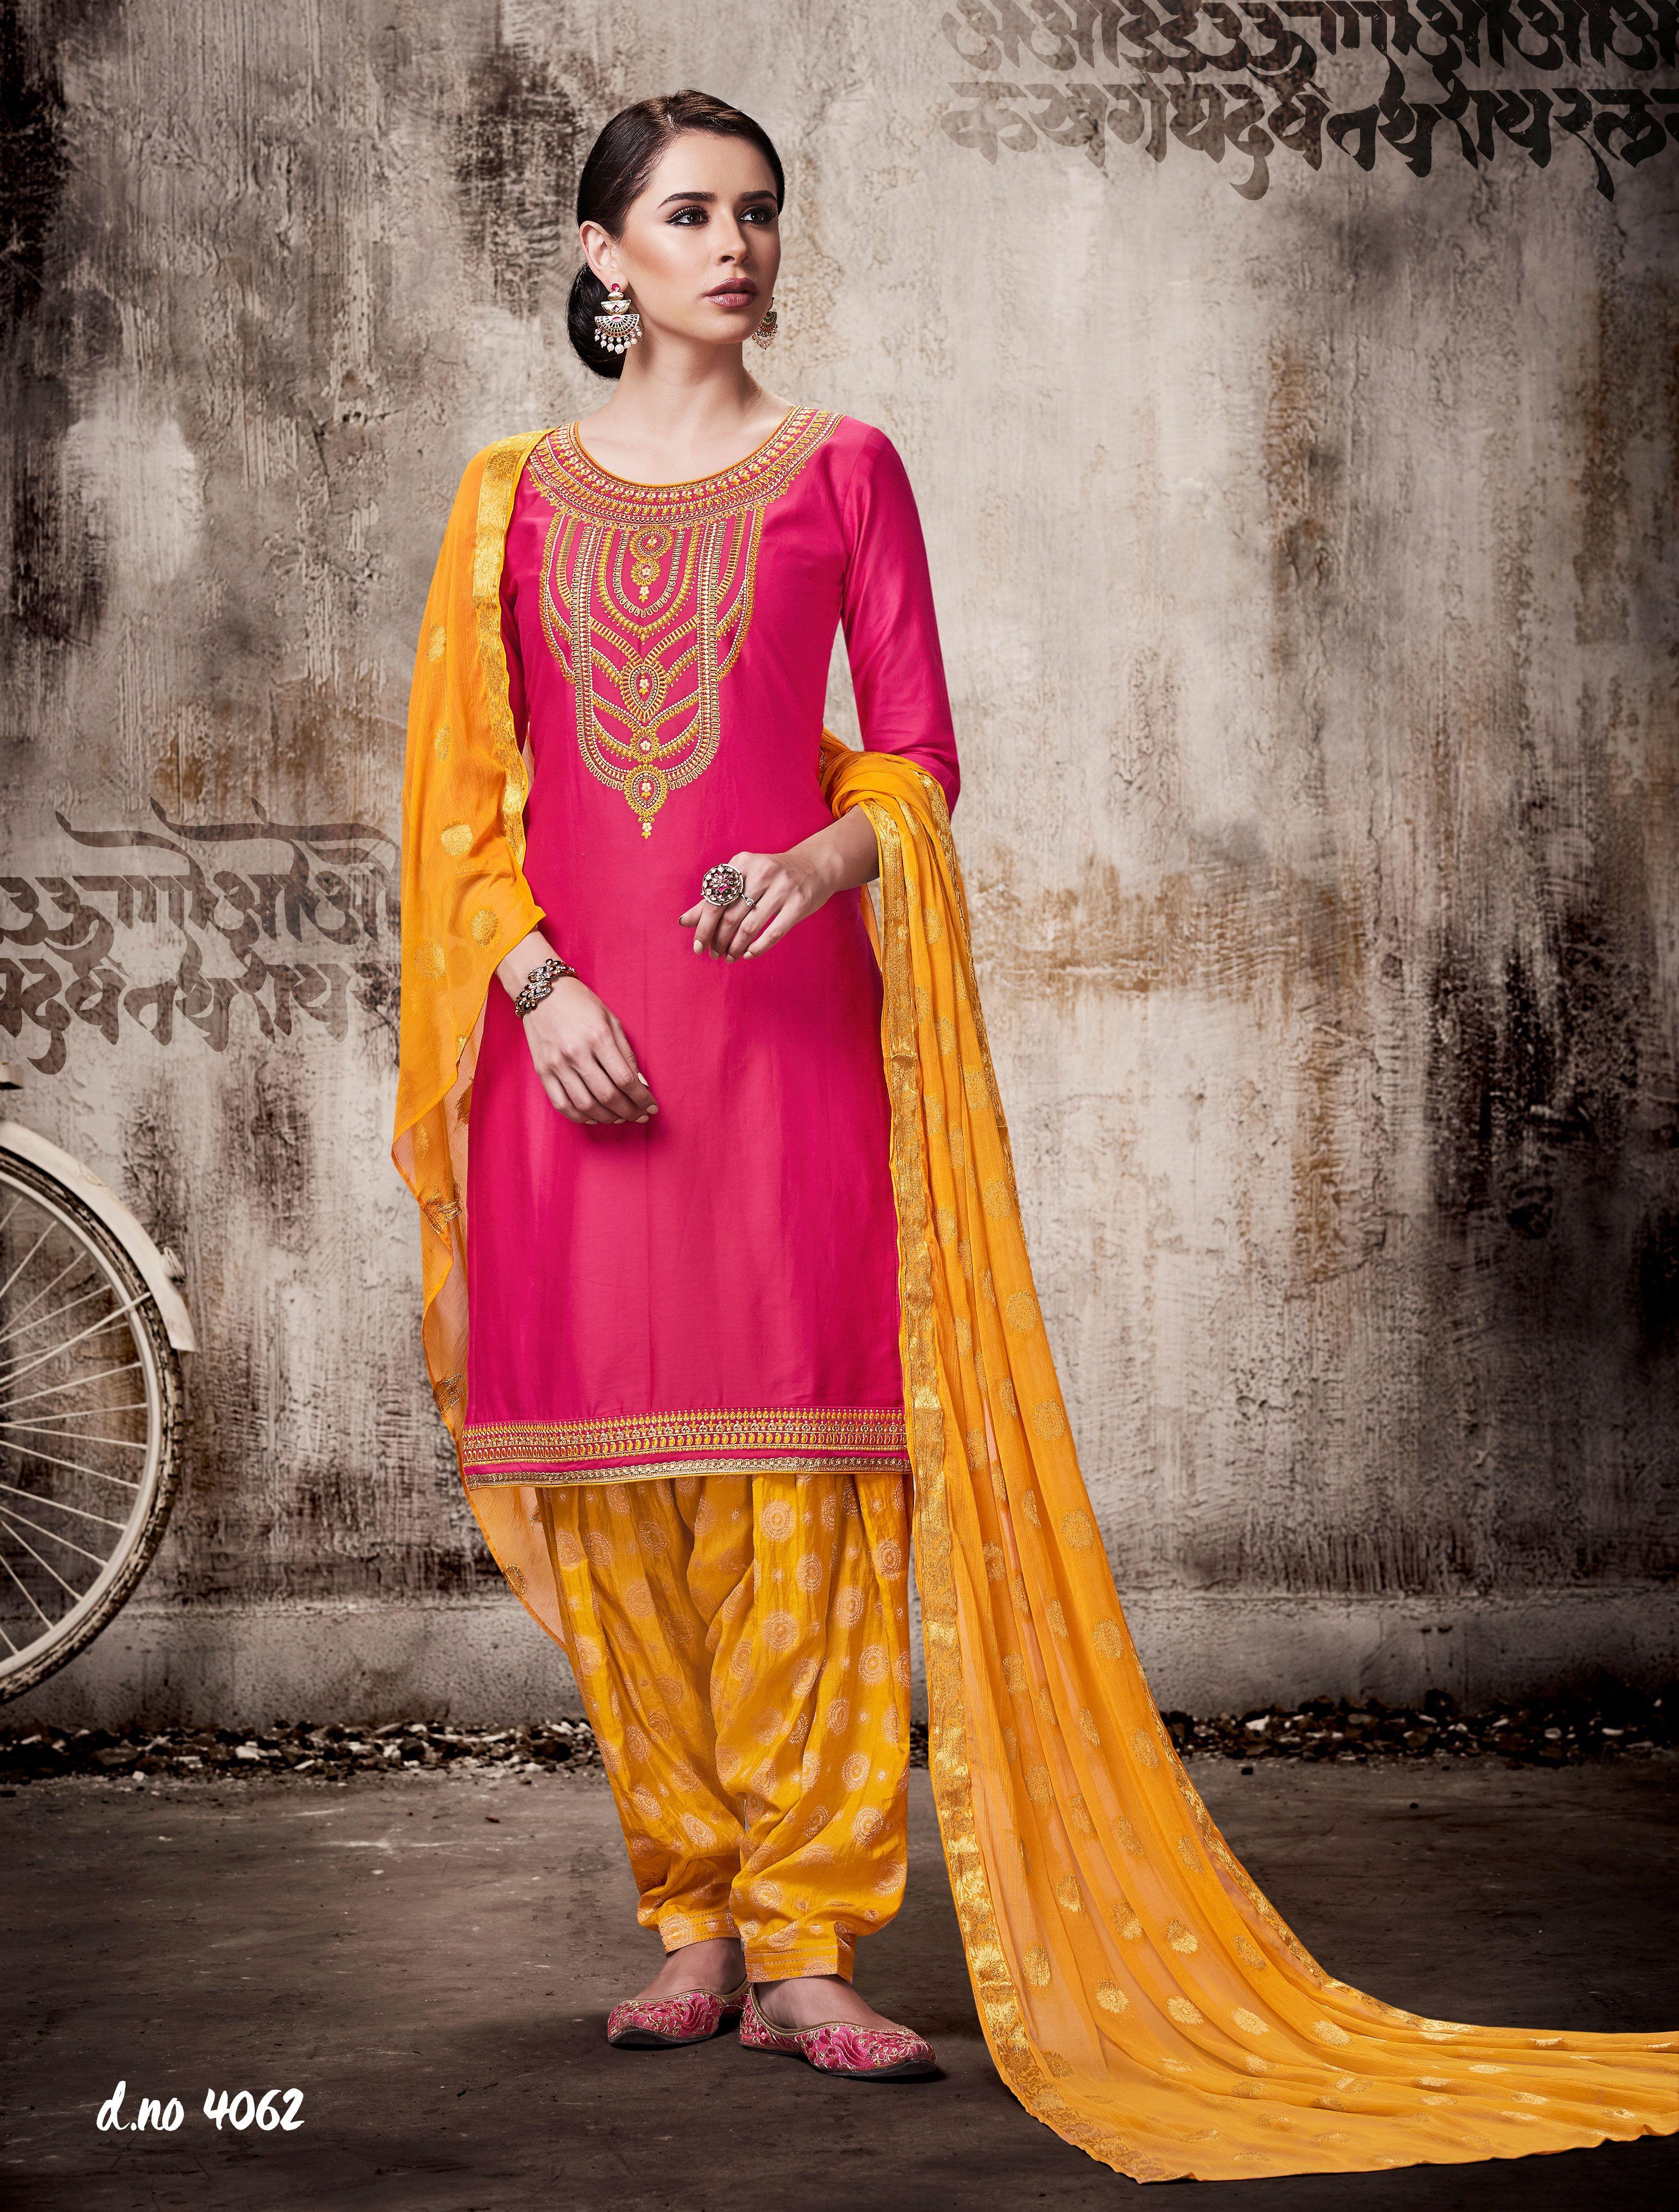 Peach yellow kessi jamsilk banarasi cotton patiyala dress